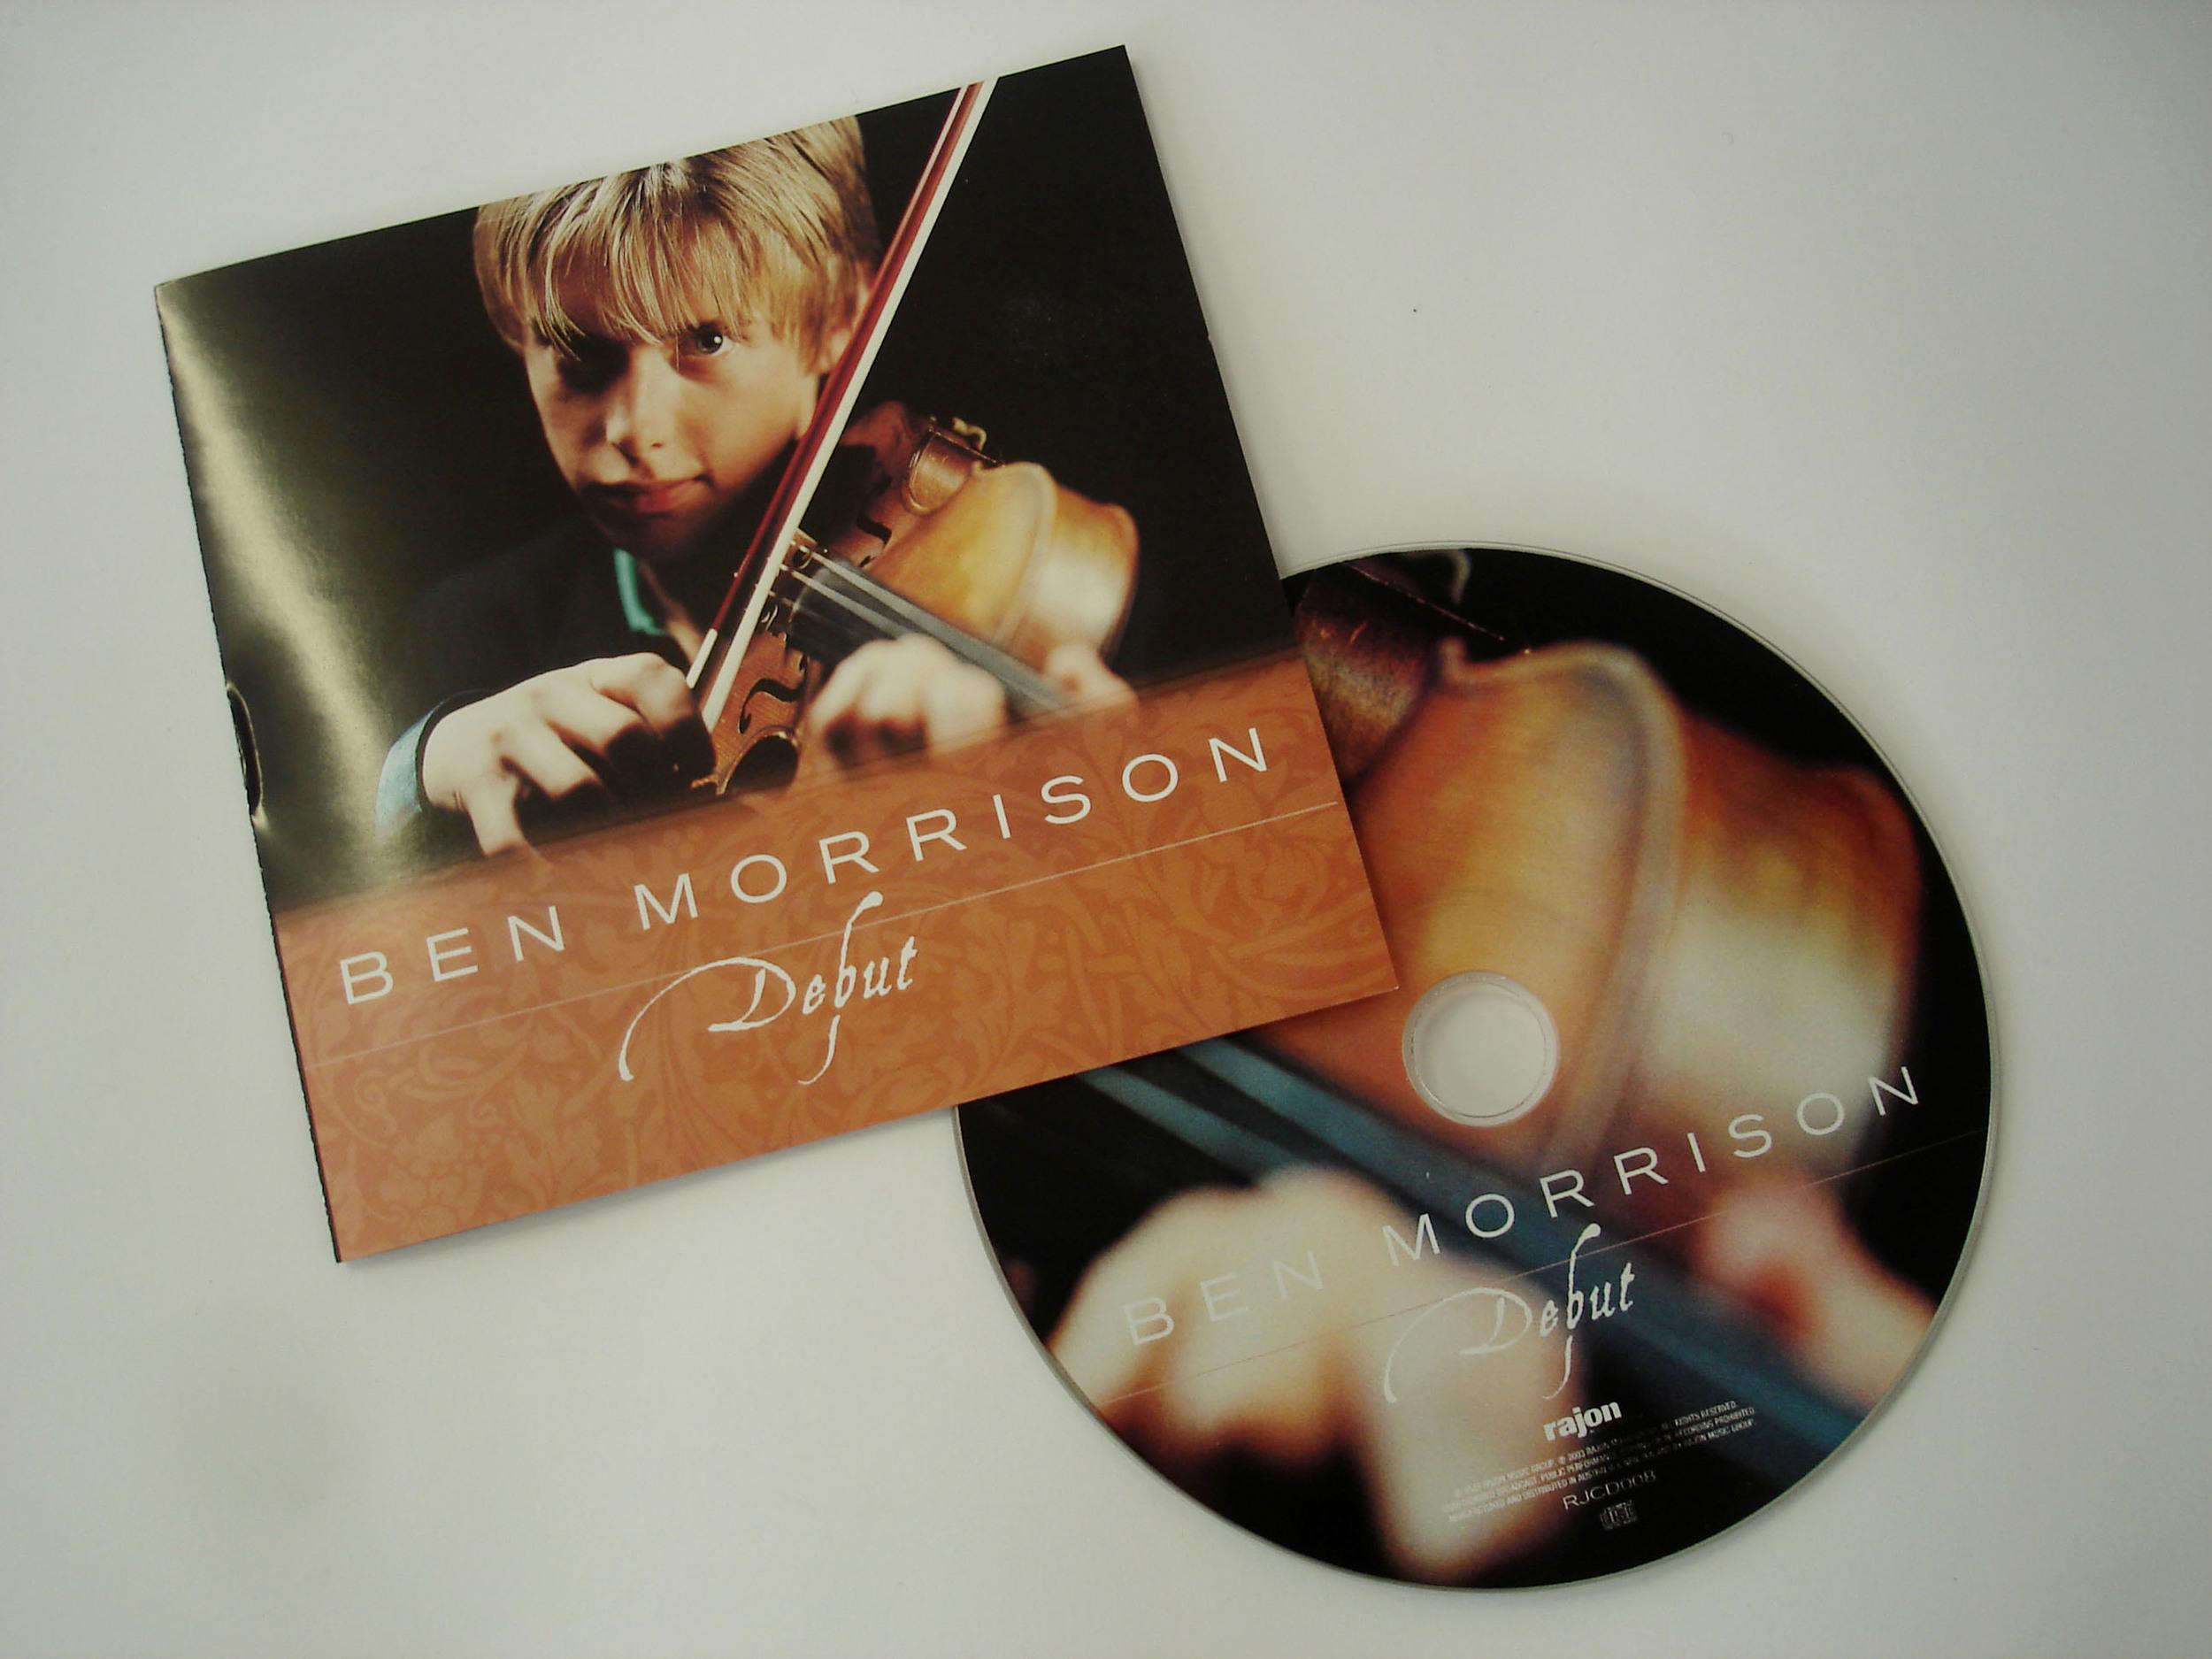 BEN MORRISON - DEBUT